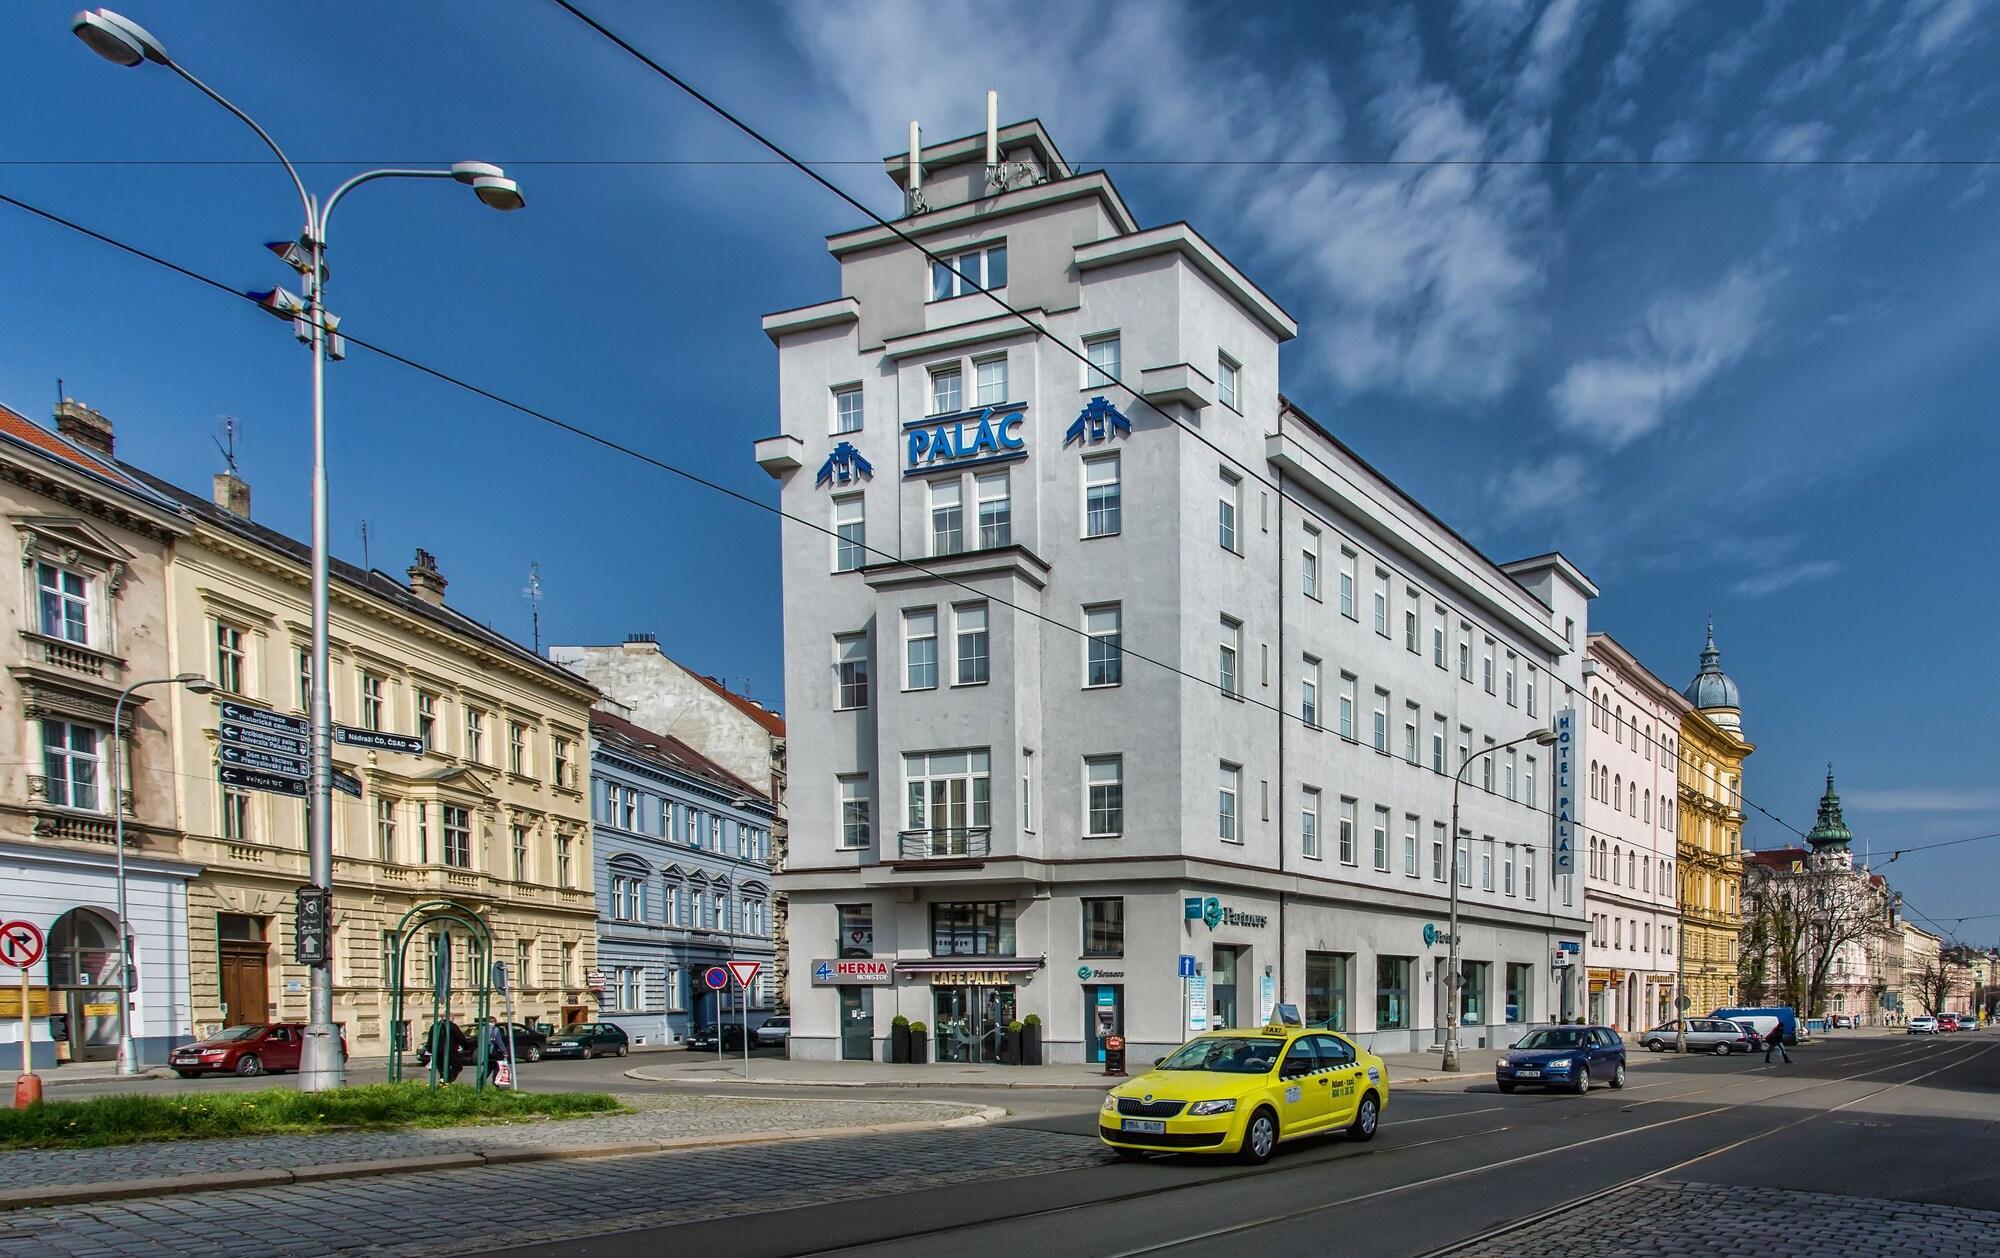 Anuncios gratis para adultos en Olomouc